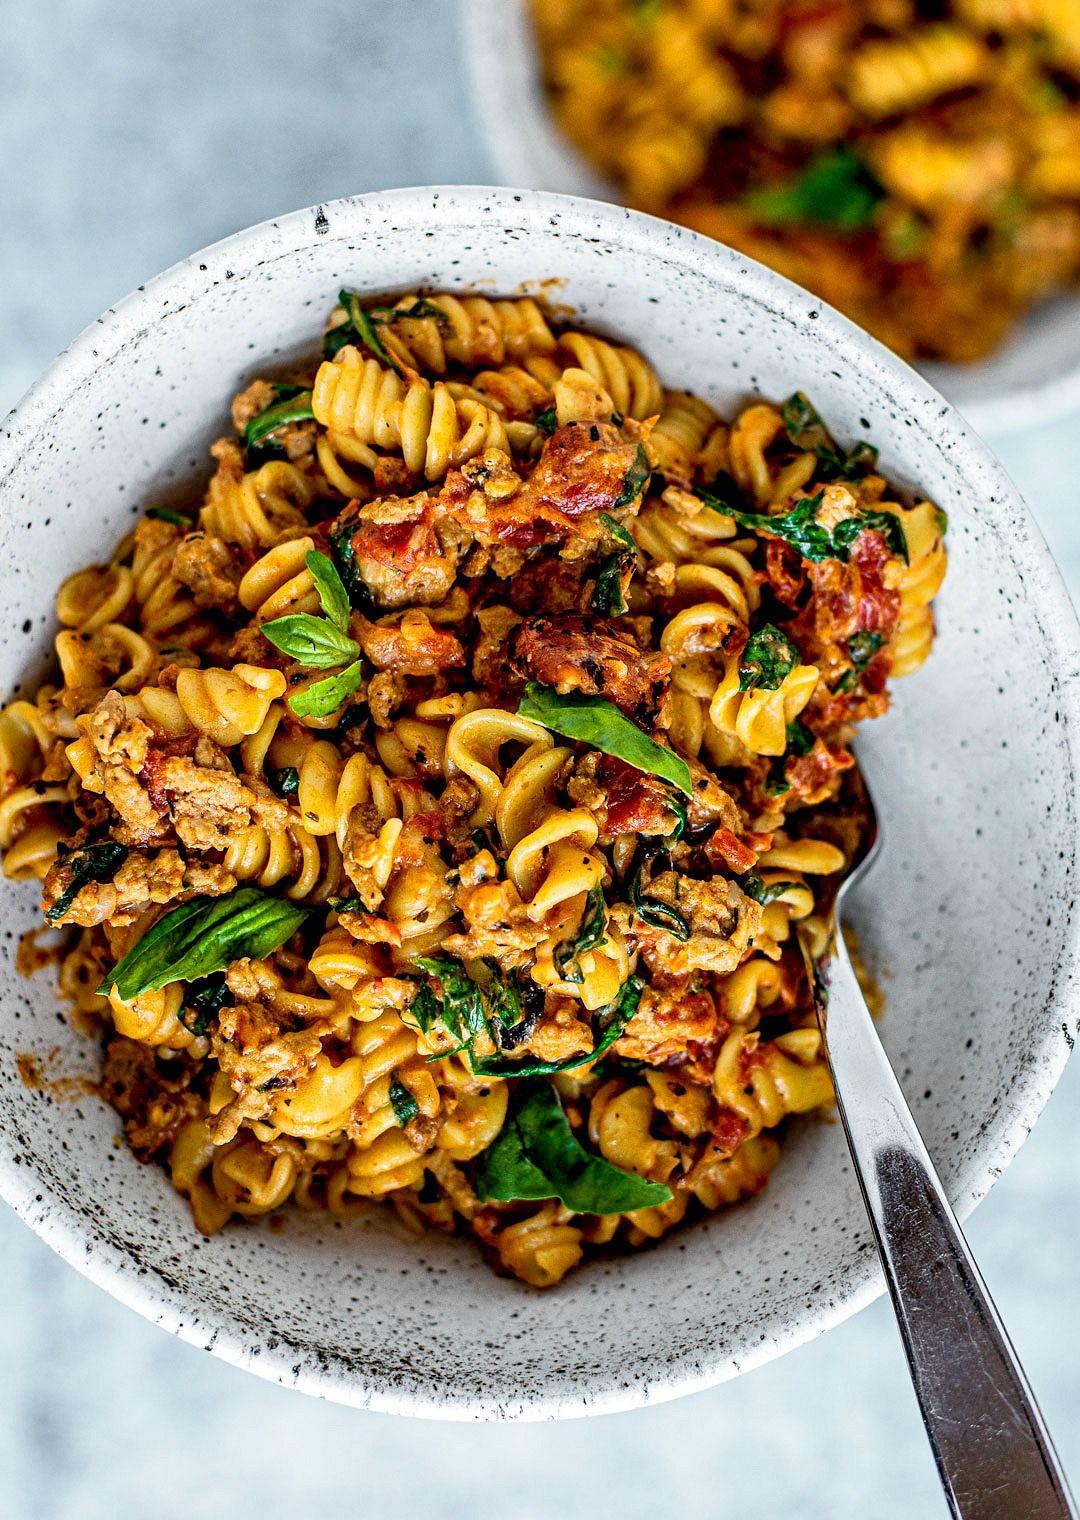 Ground Turkey Instant Pot Meals : Pin on Instant Pot Pasta Recipes